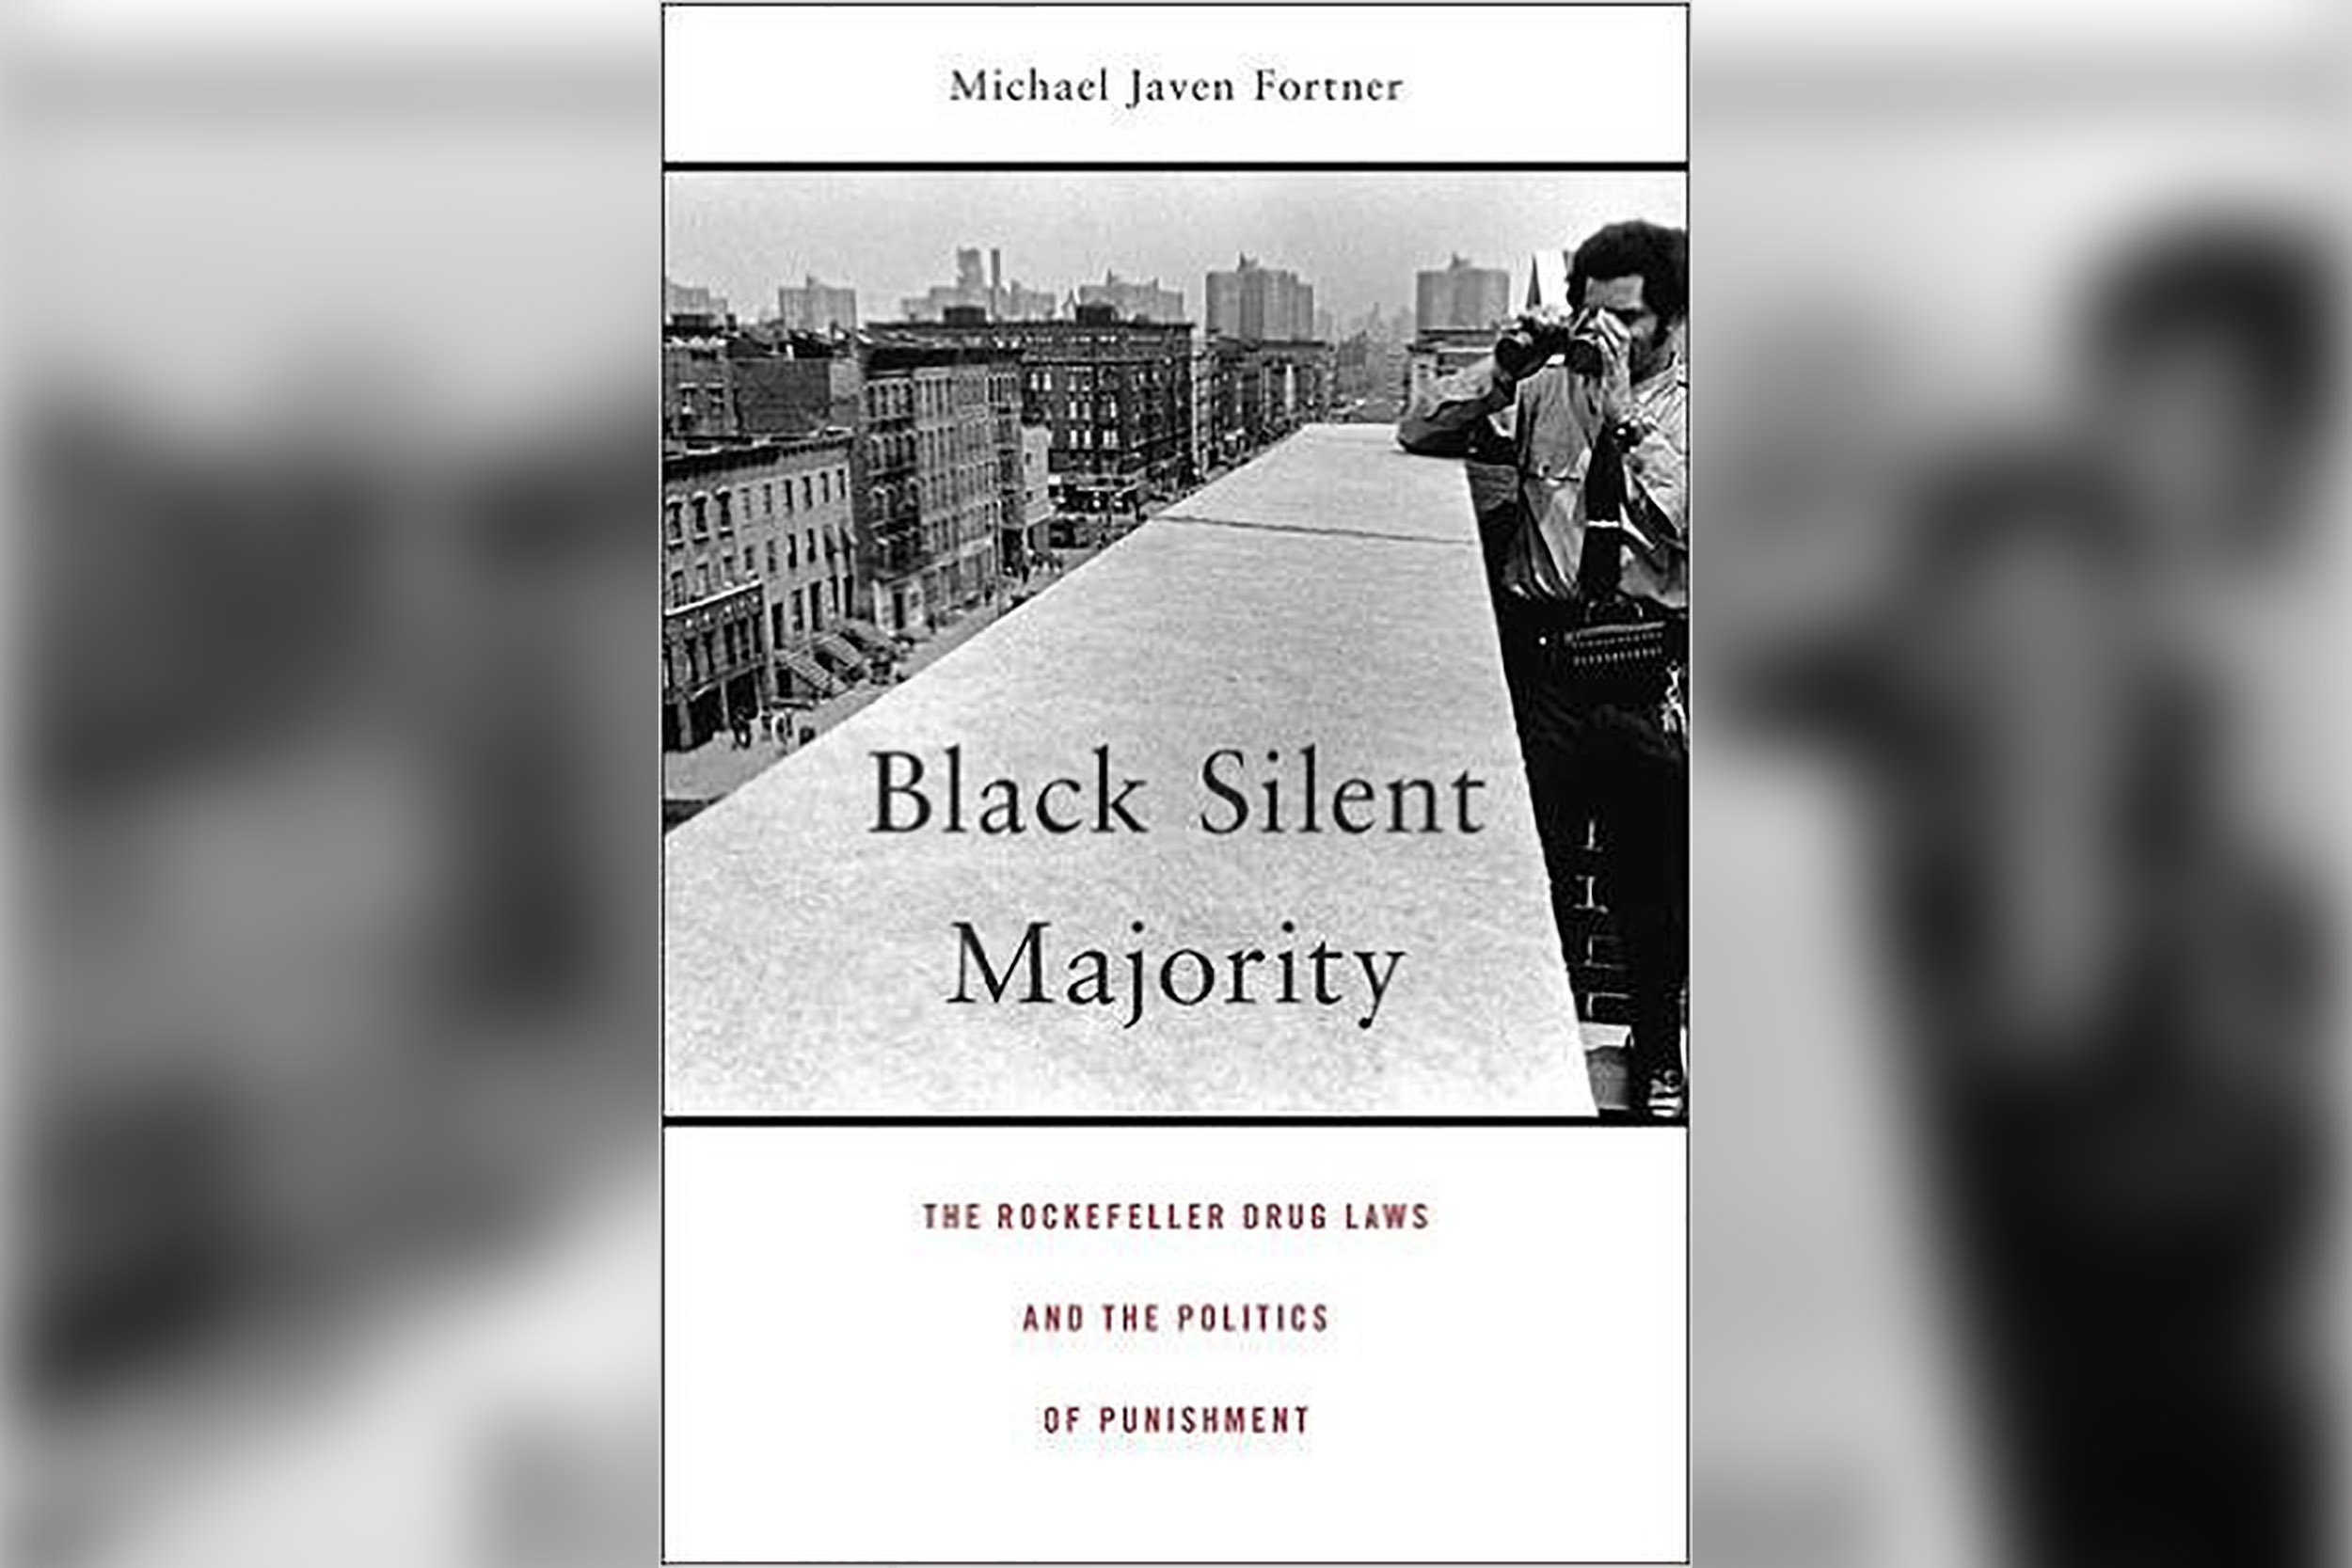 Ta-Nehisi Coates is the neoliberal face of the black freedom struggle